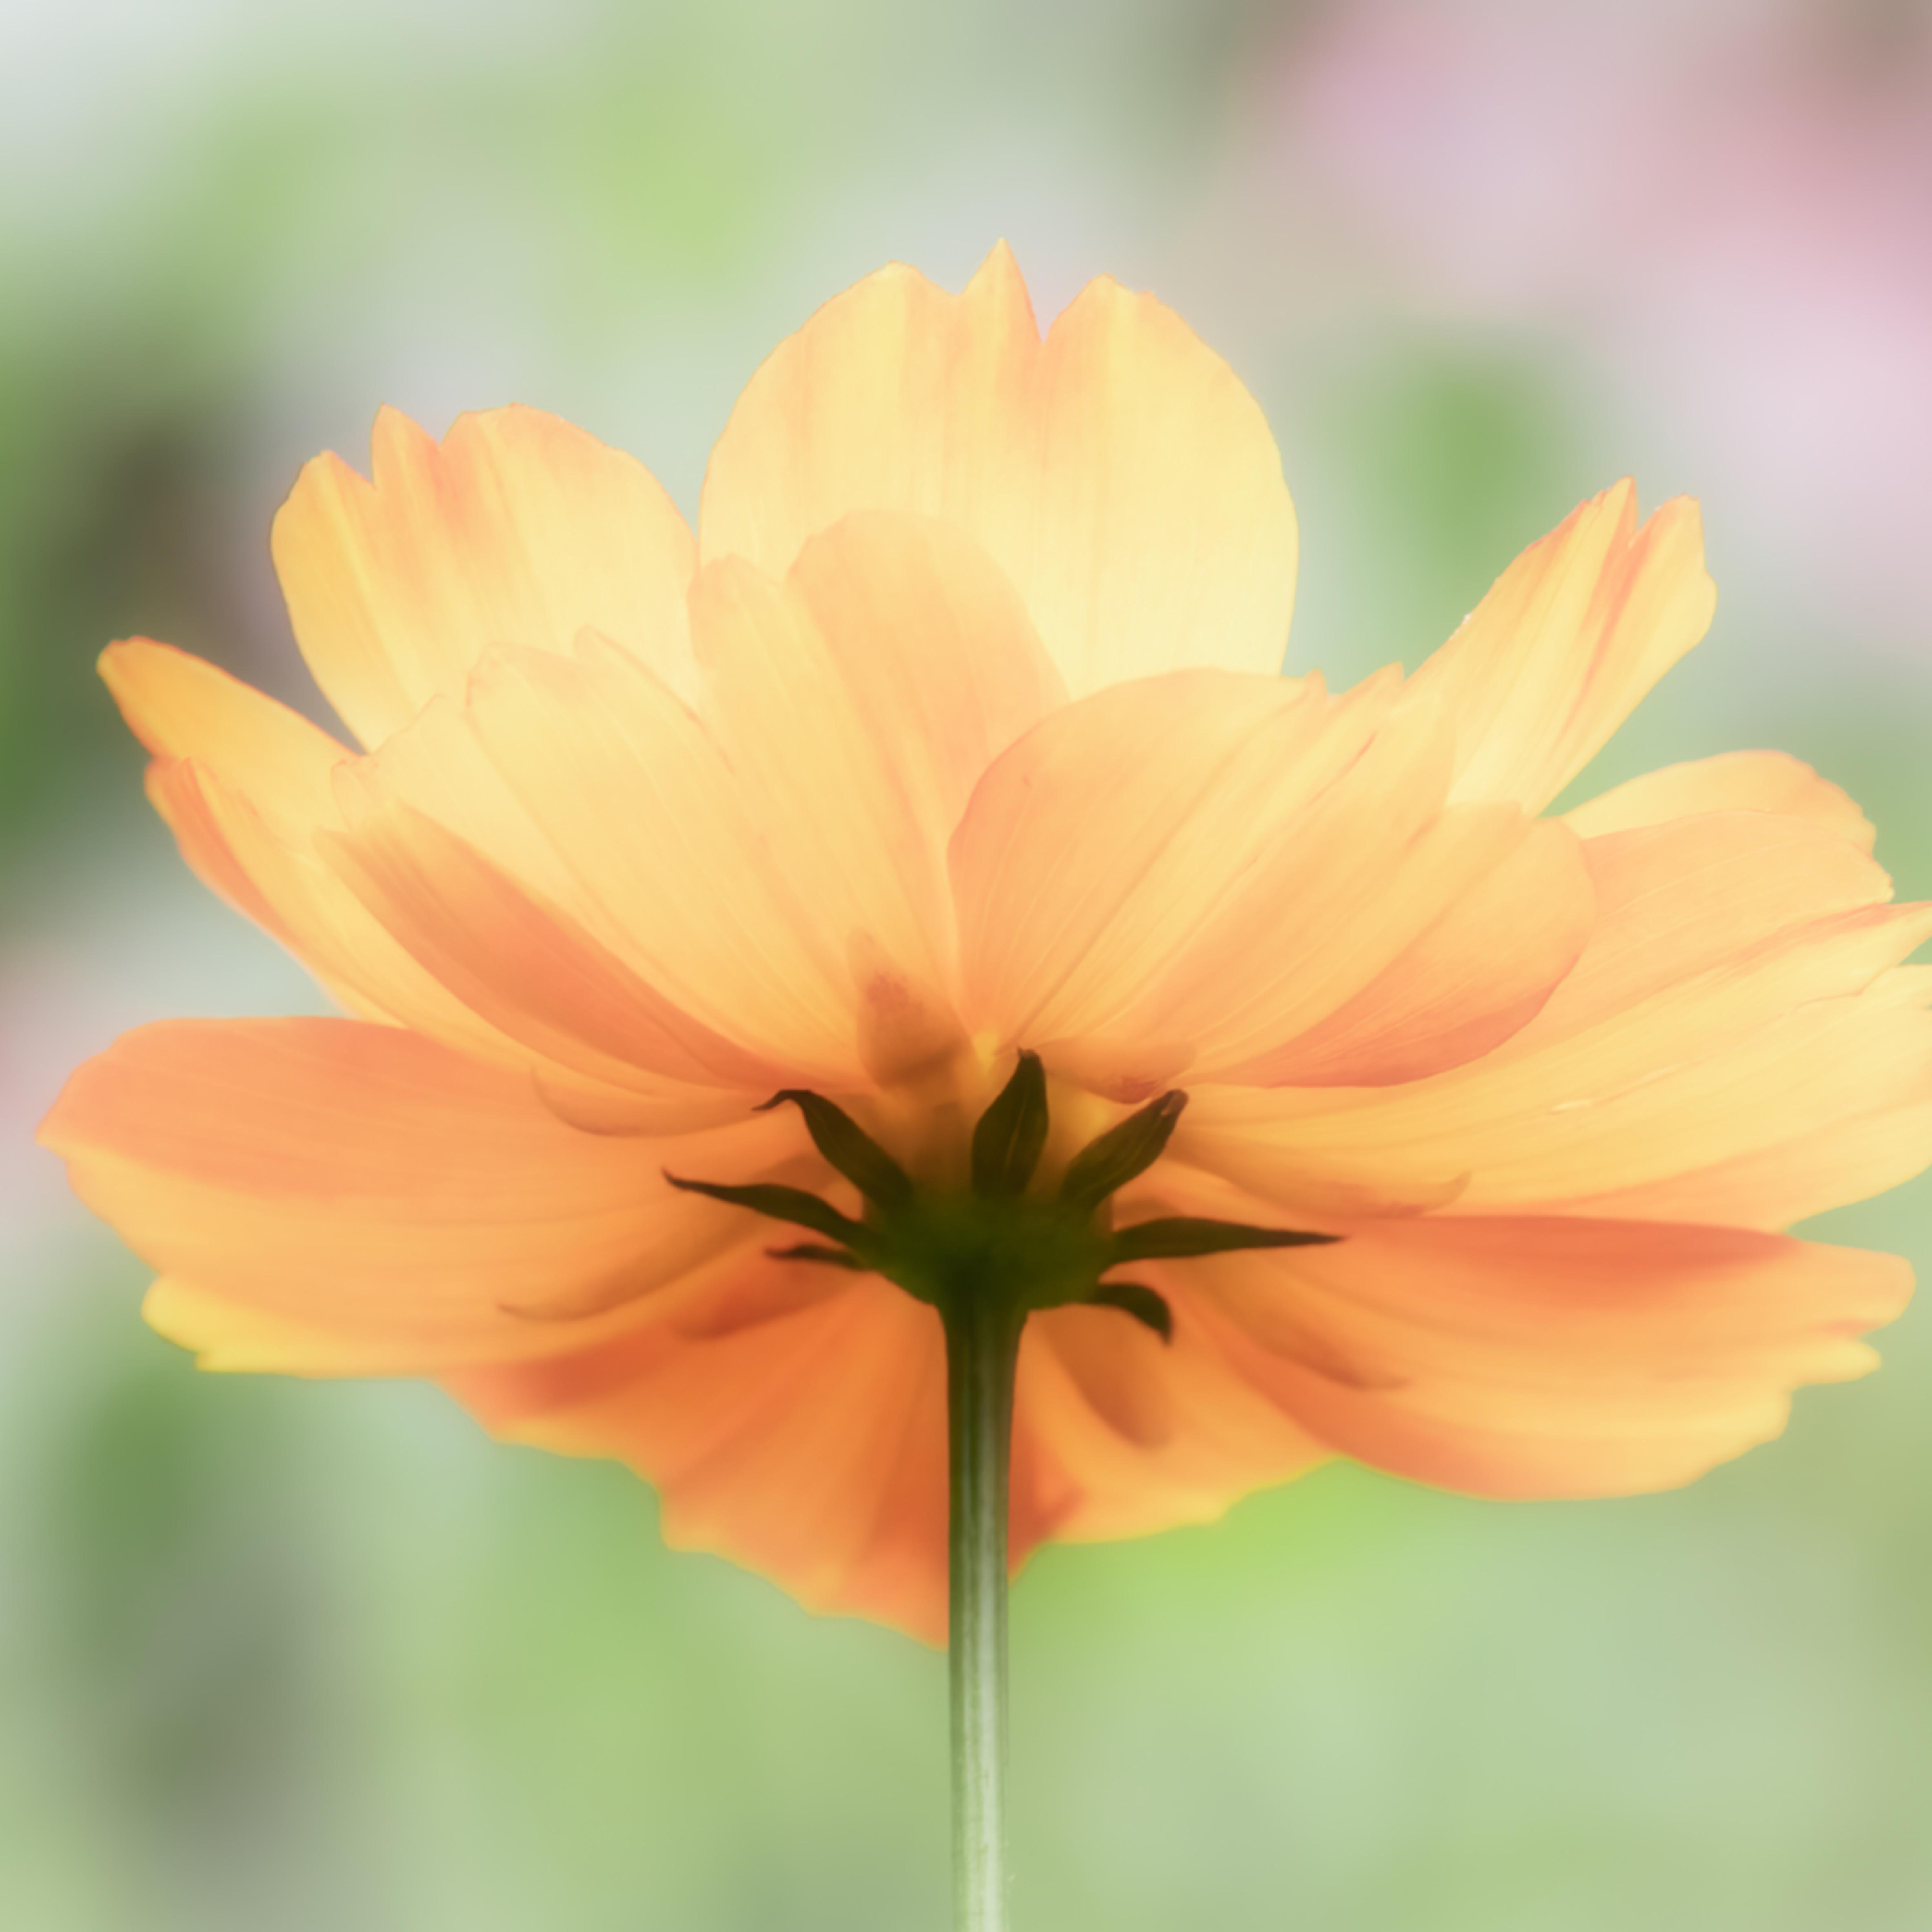 Orange flower on pastel background   8 by 10 bau8v0